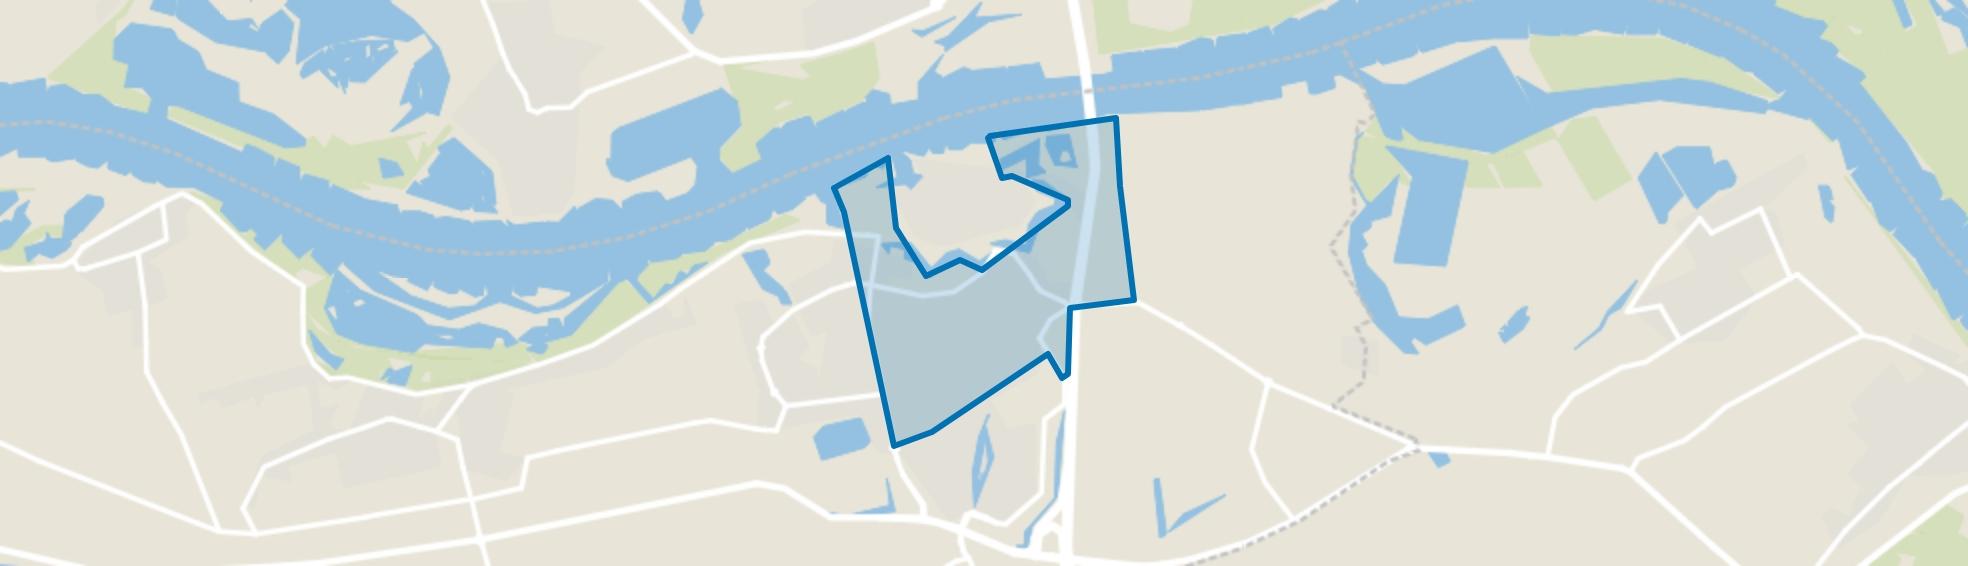 Zaltbommel Vergt en omgeving, Zaltbommel map